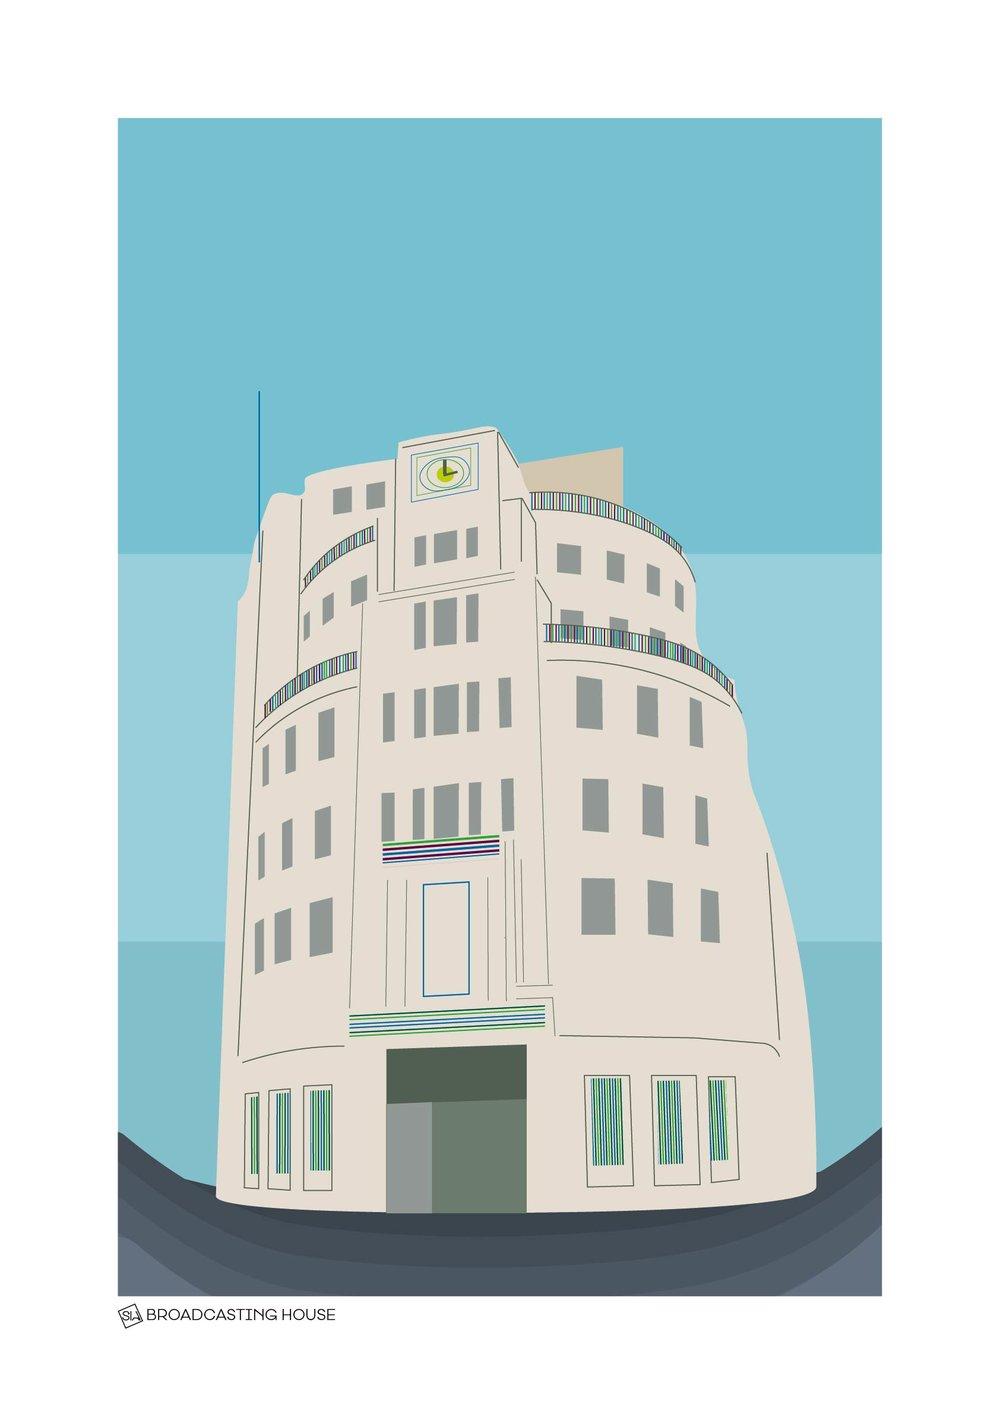 London 100_31_Broadcasting House Airy.jpg